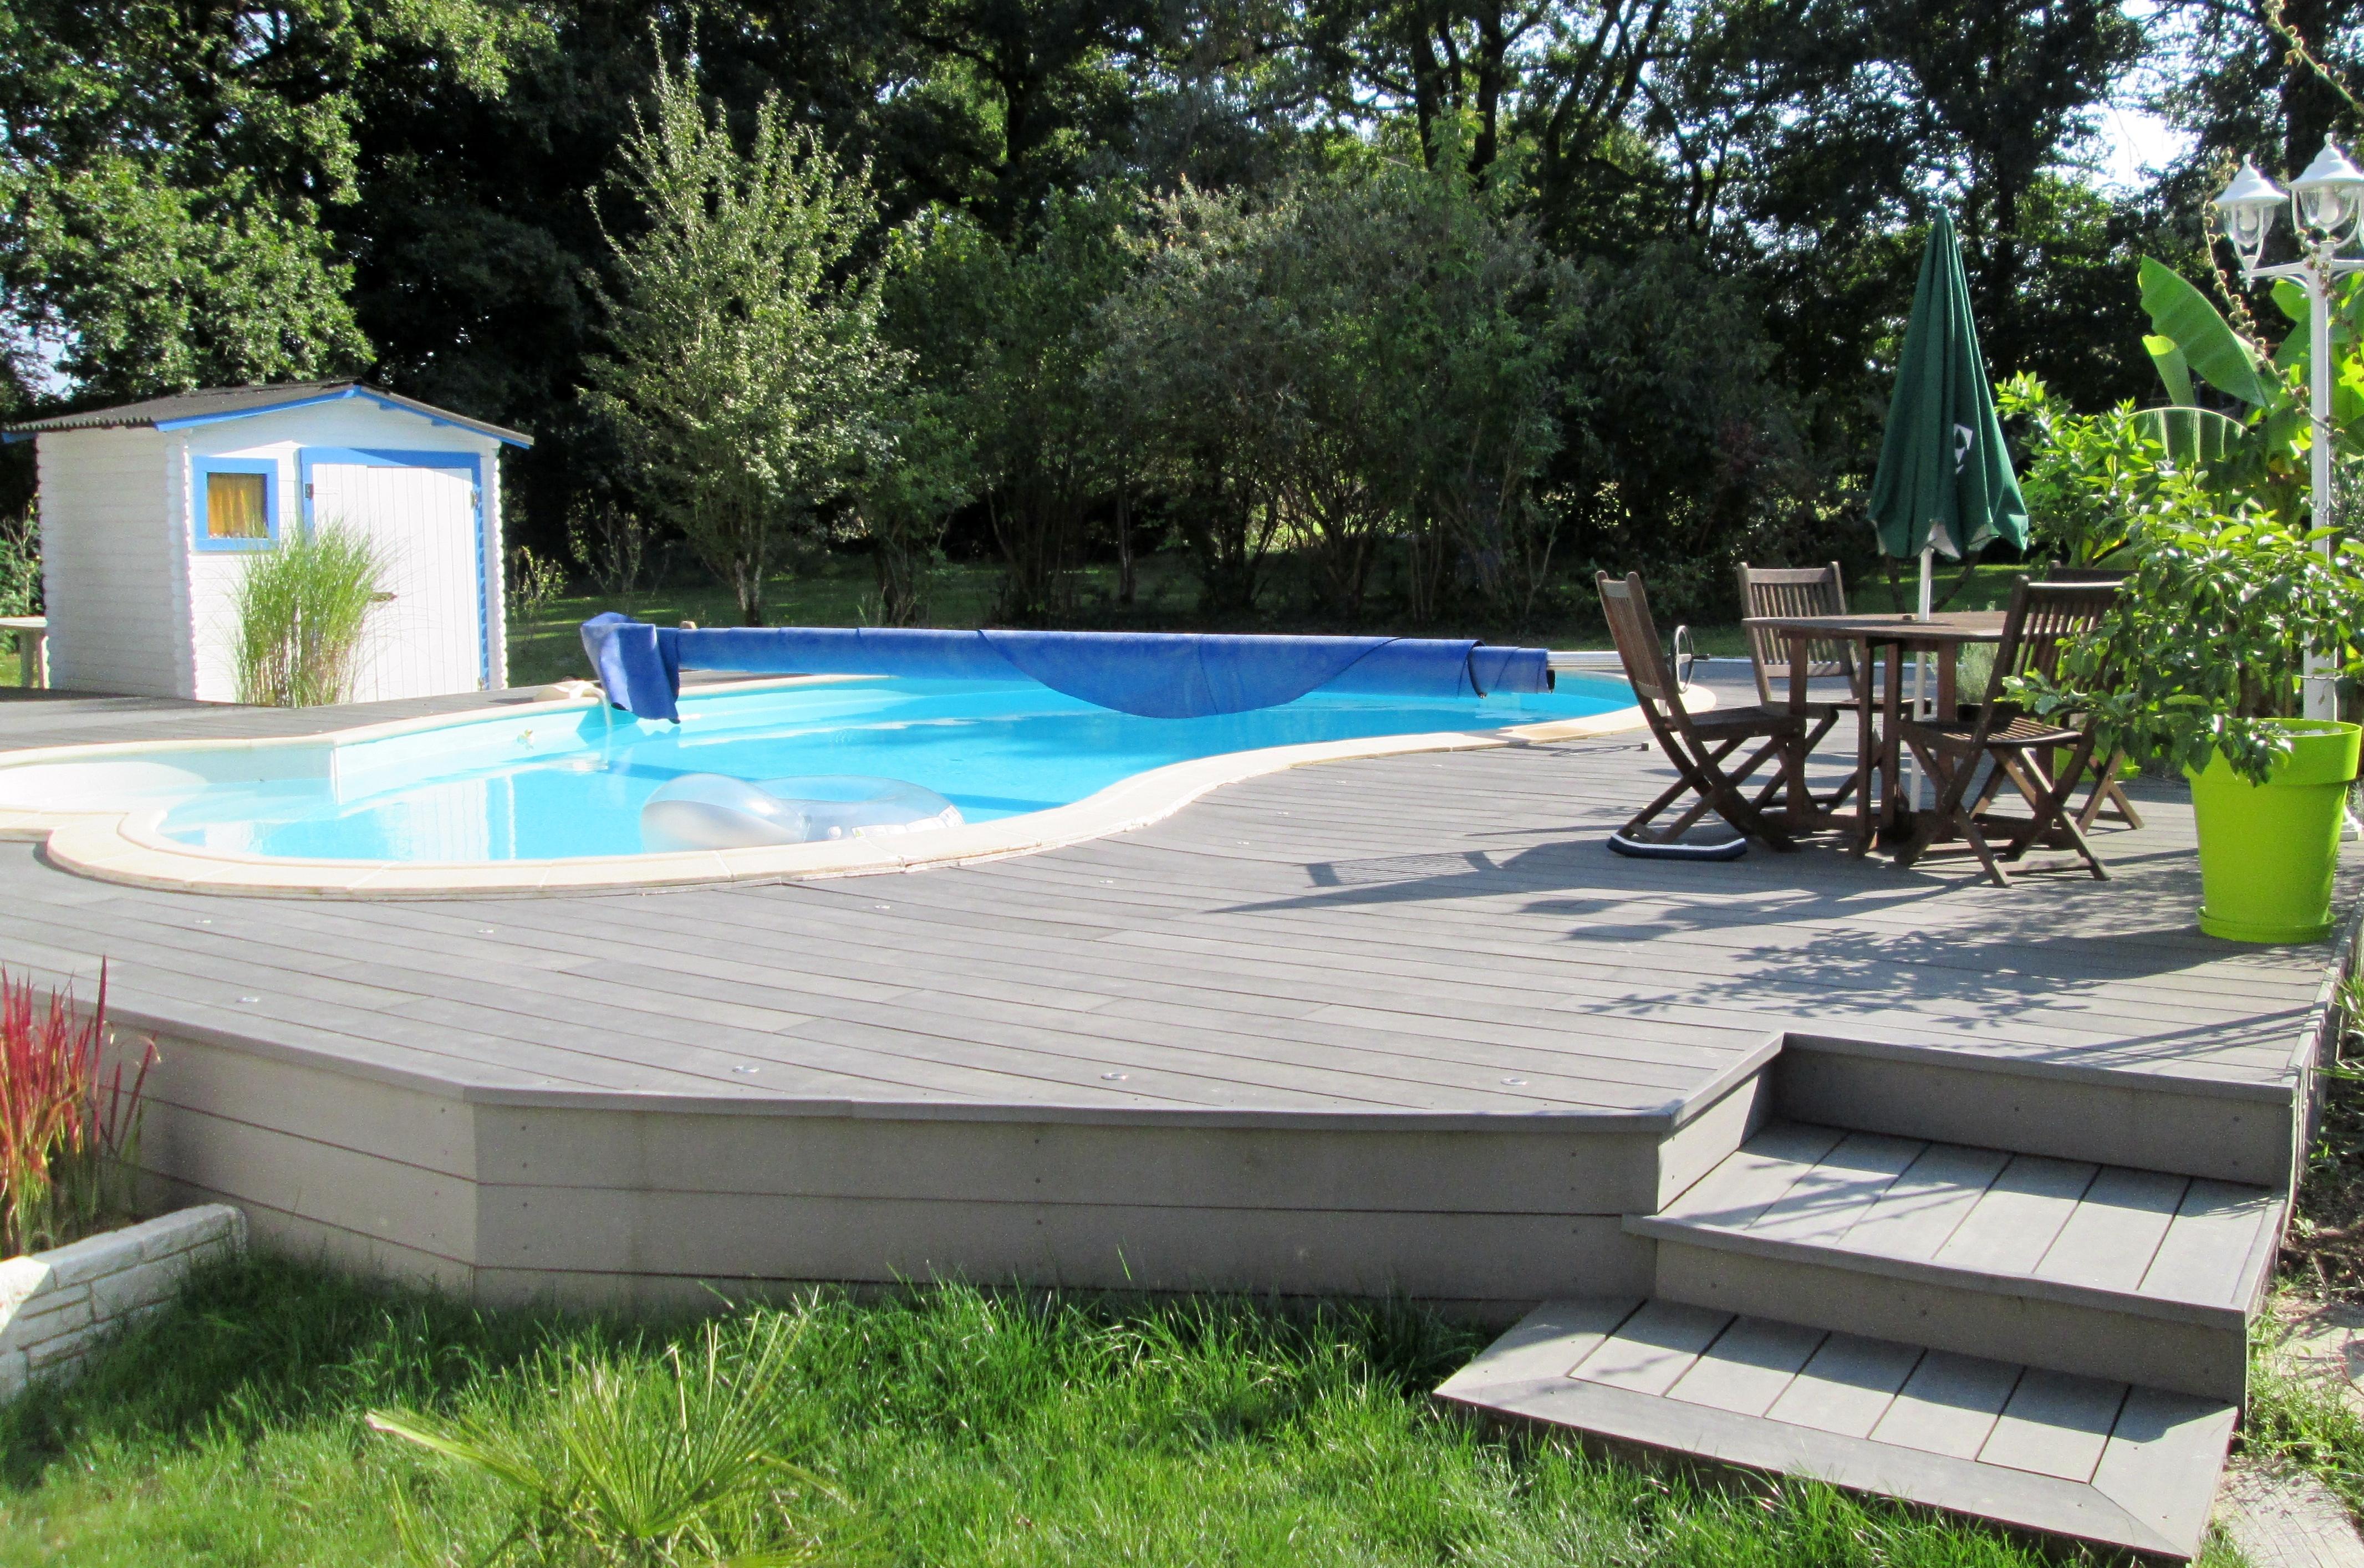 terrasse piscine pente. Black Bedroom Furniture Sets. Home Design Ideas